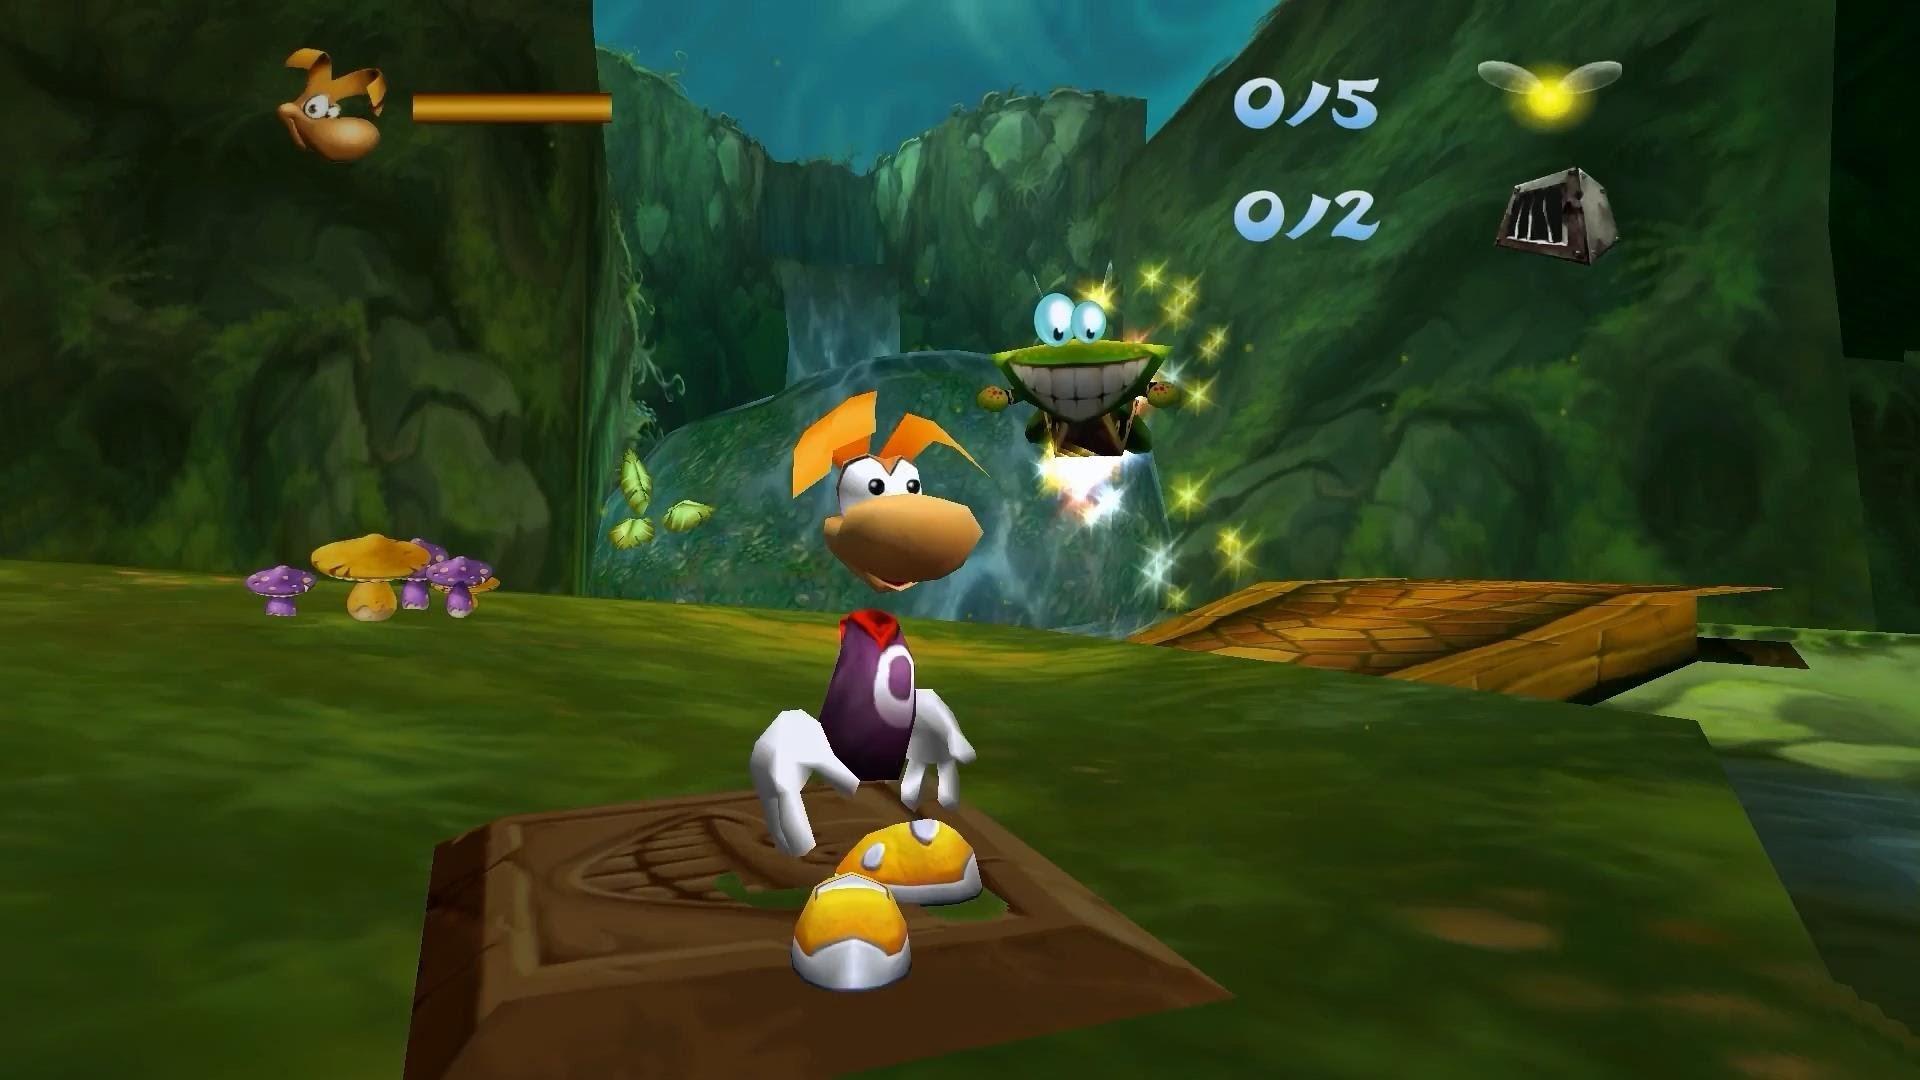 nullDC Emulator 1.0.4 | Rayman 2: The Great Escape [1080p HD] | Sega  Dreamcast – YouTube